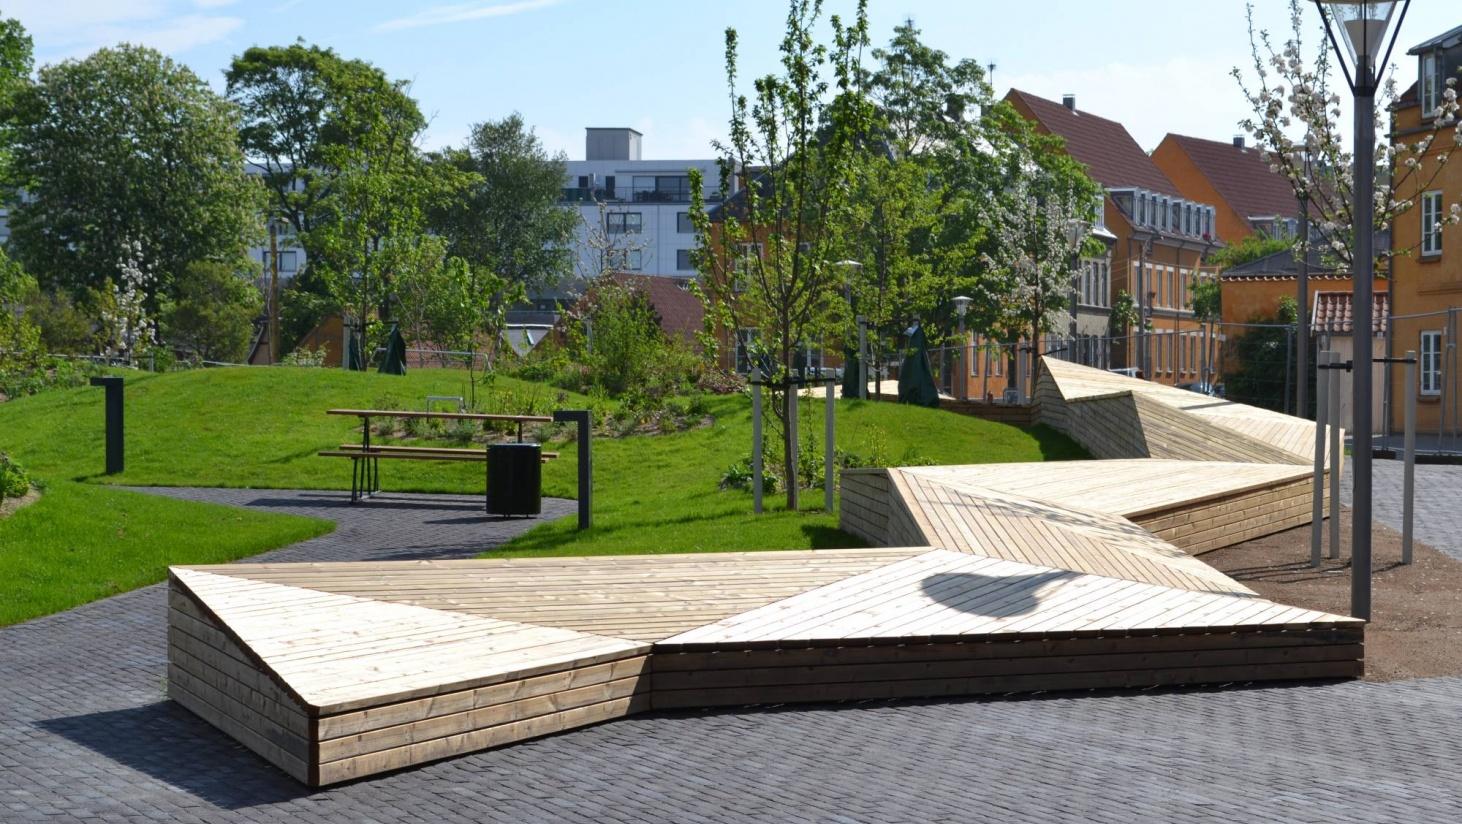 Platting bygget i offentlig rom